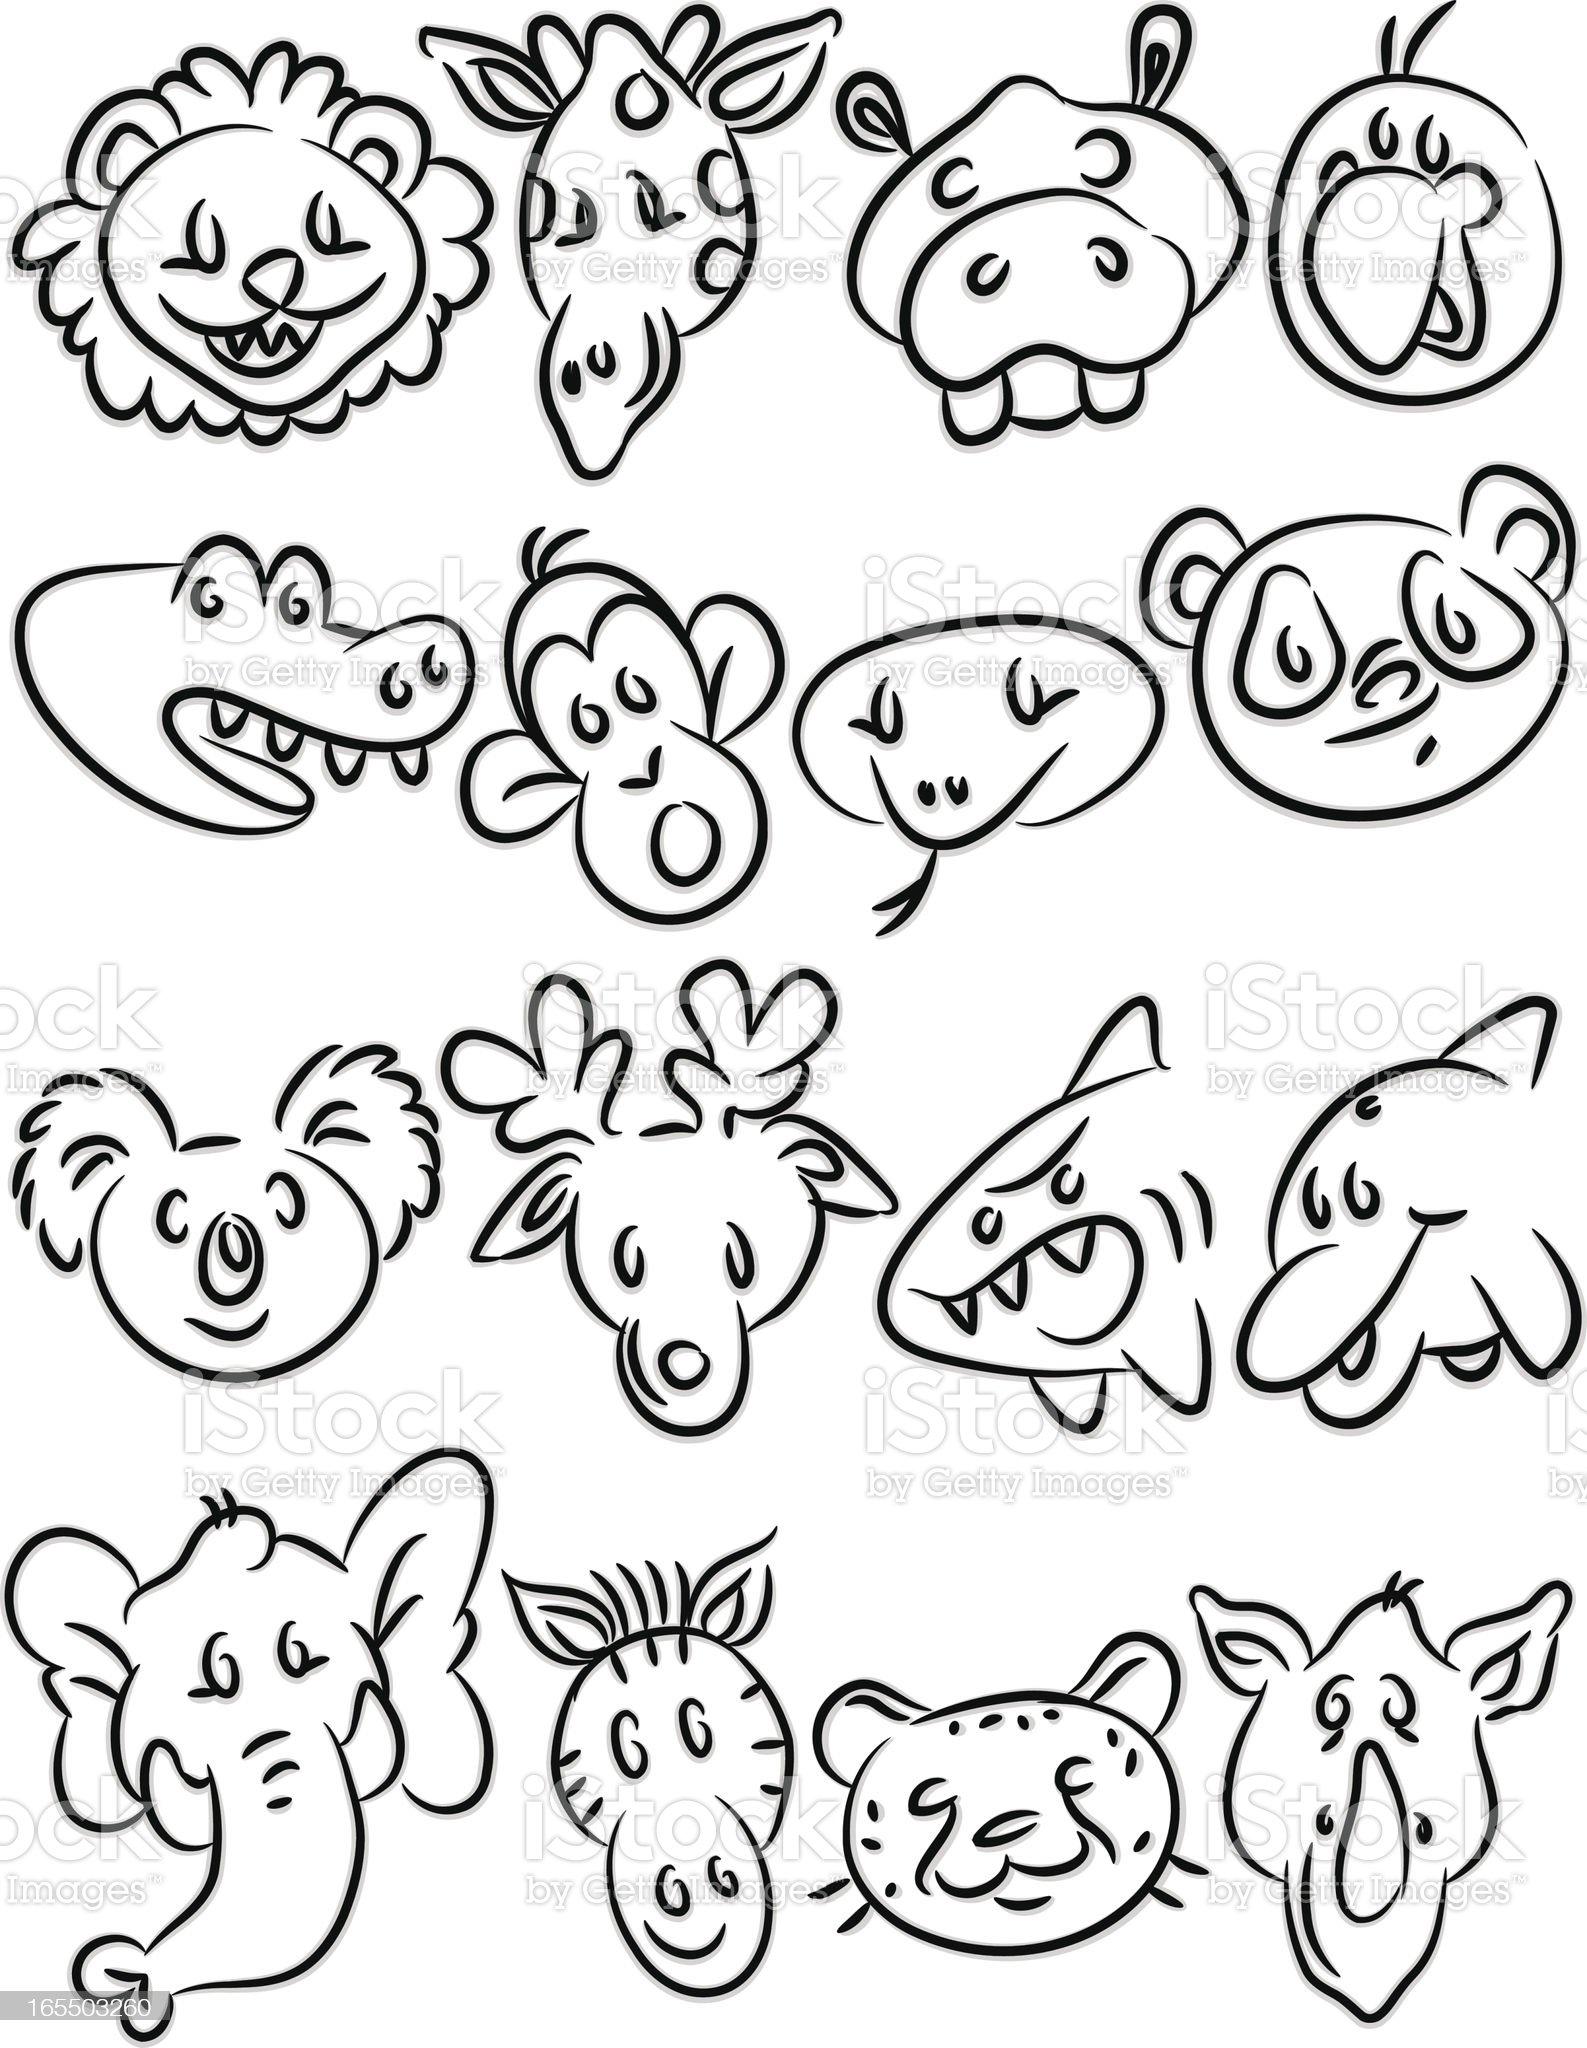 Animal Icons II royalty-free stock vector art